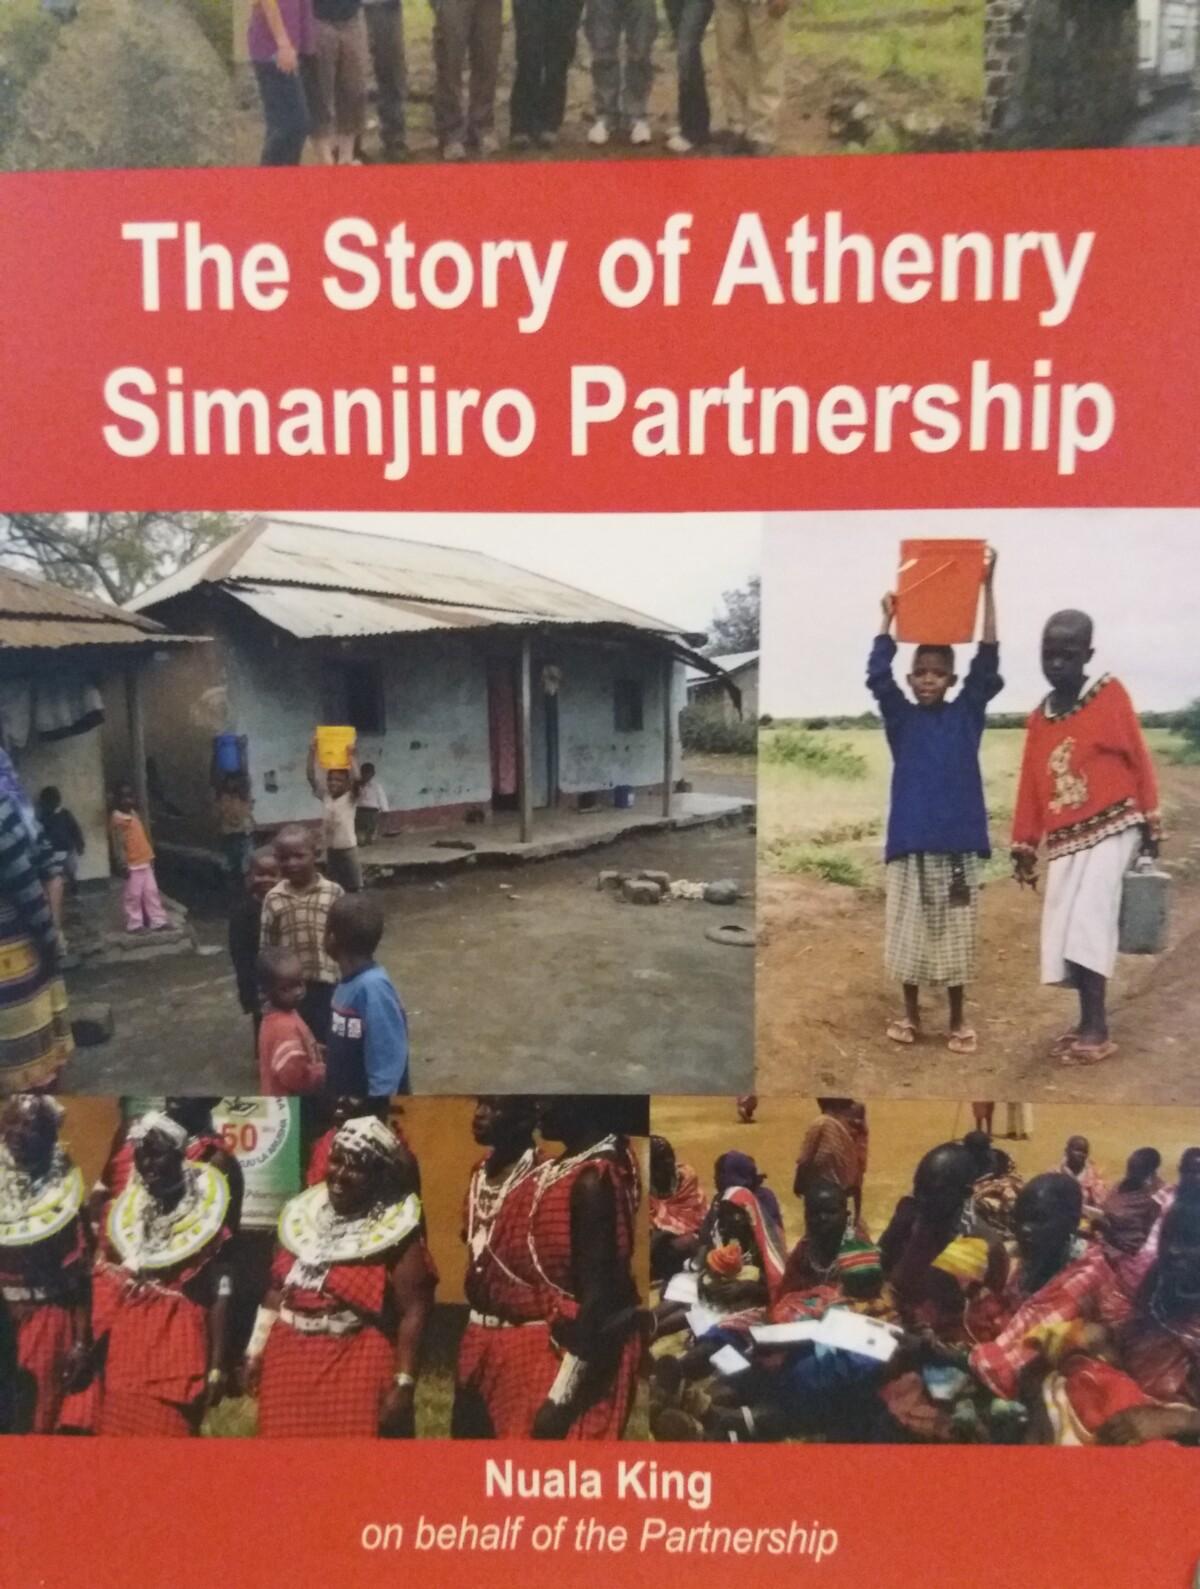 The Story of Athenry Simanjiro Partnership